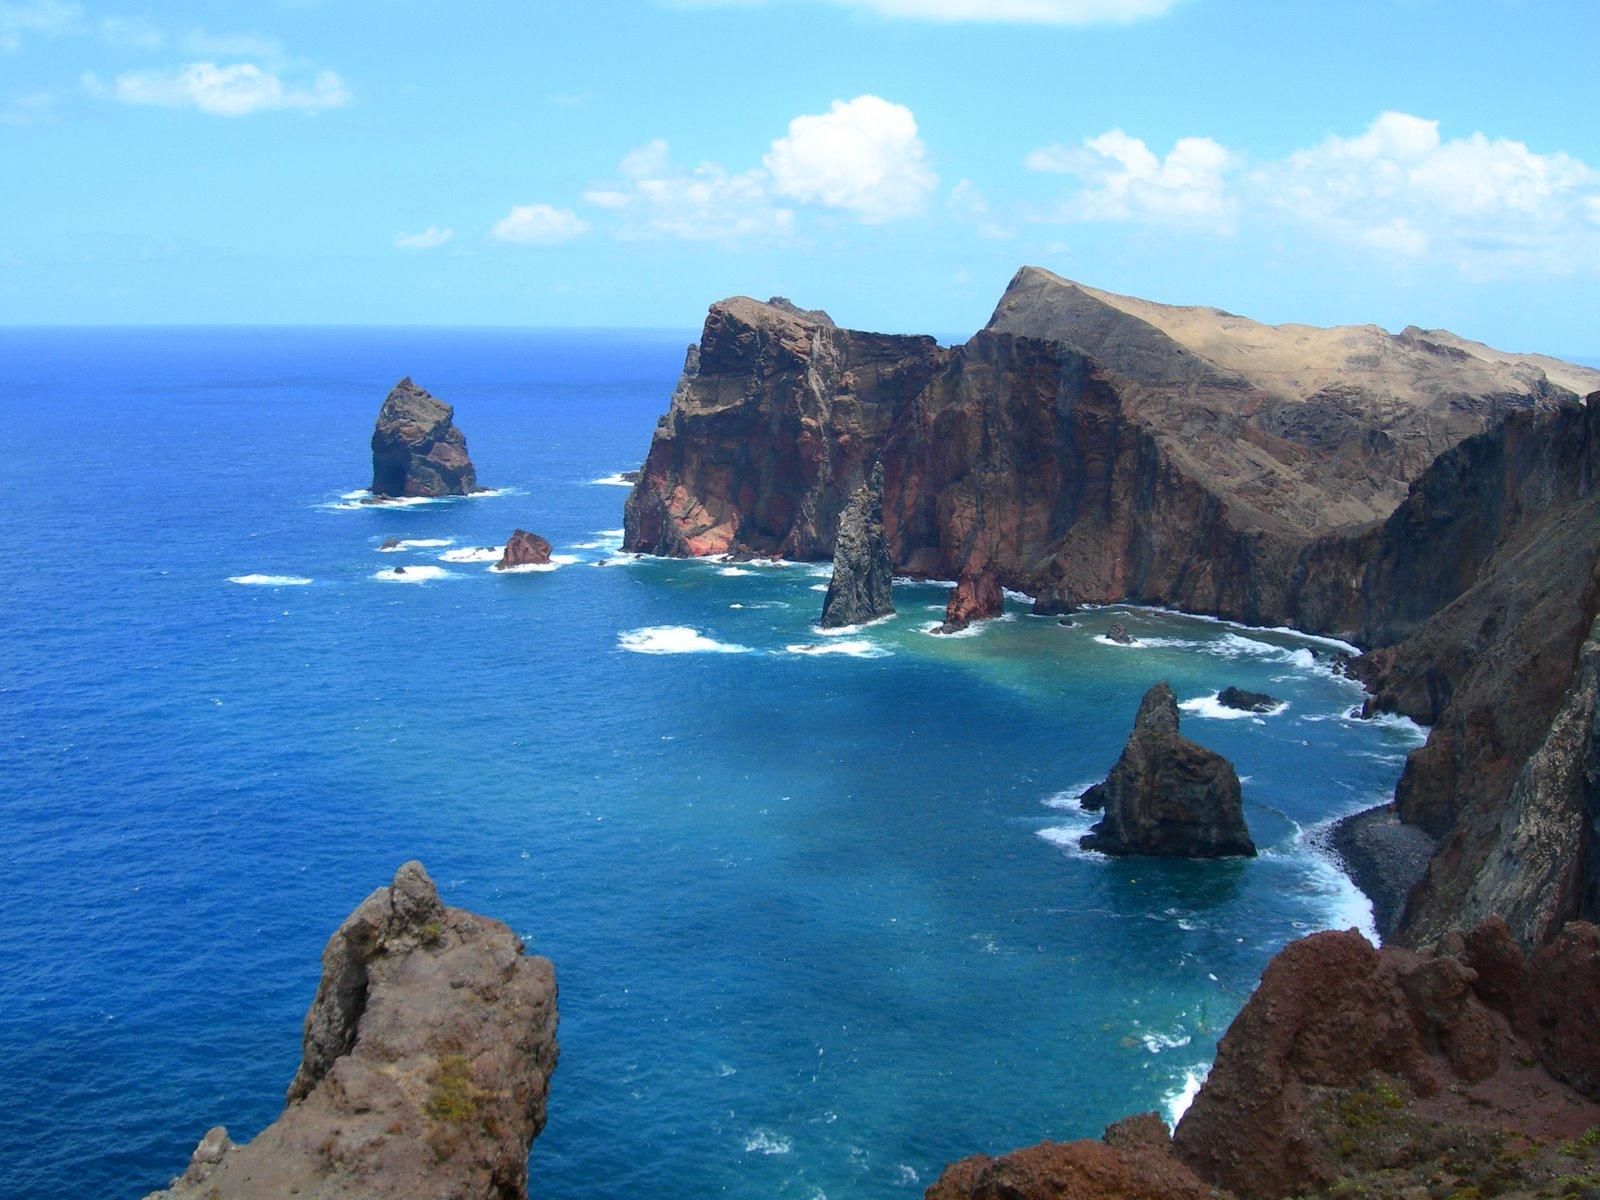 http://www.fmboschetto.it/images/geologia/scogliera_Madeira.JPG